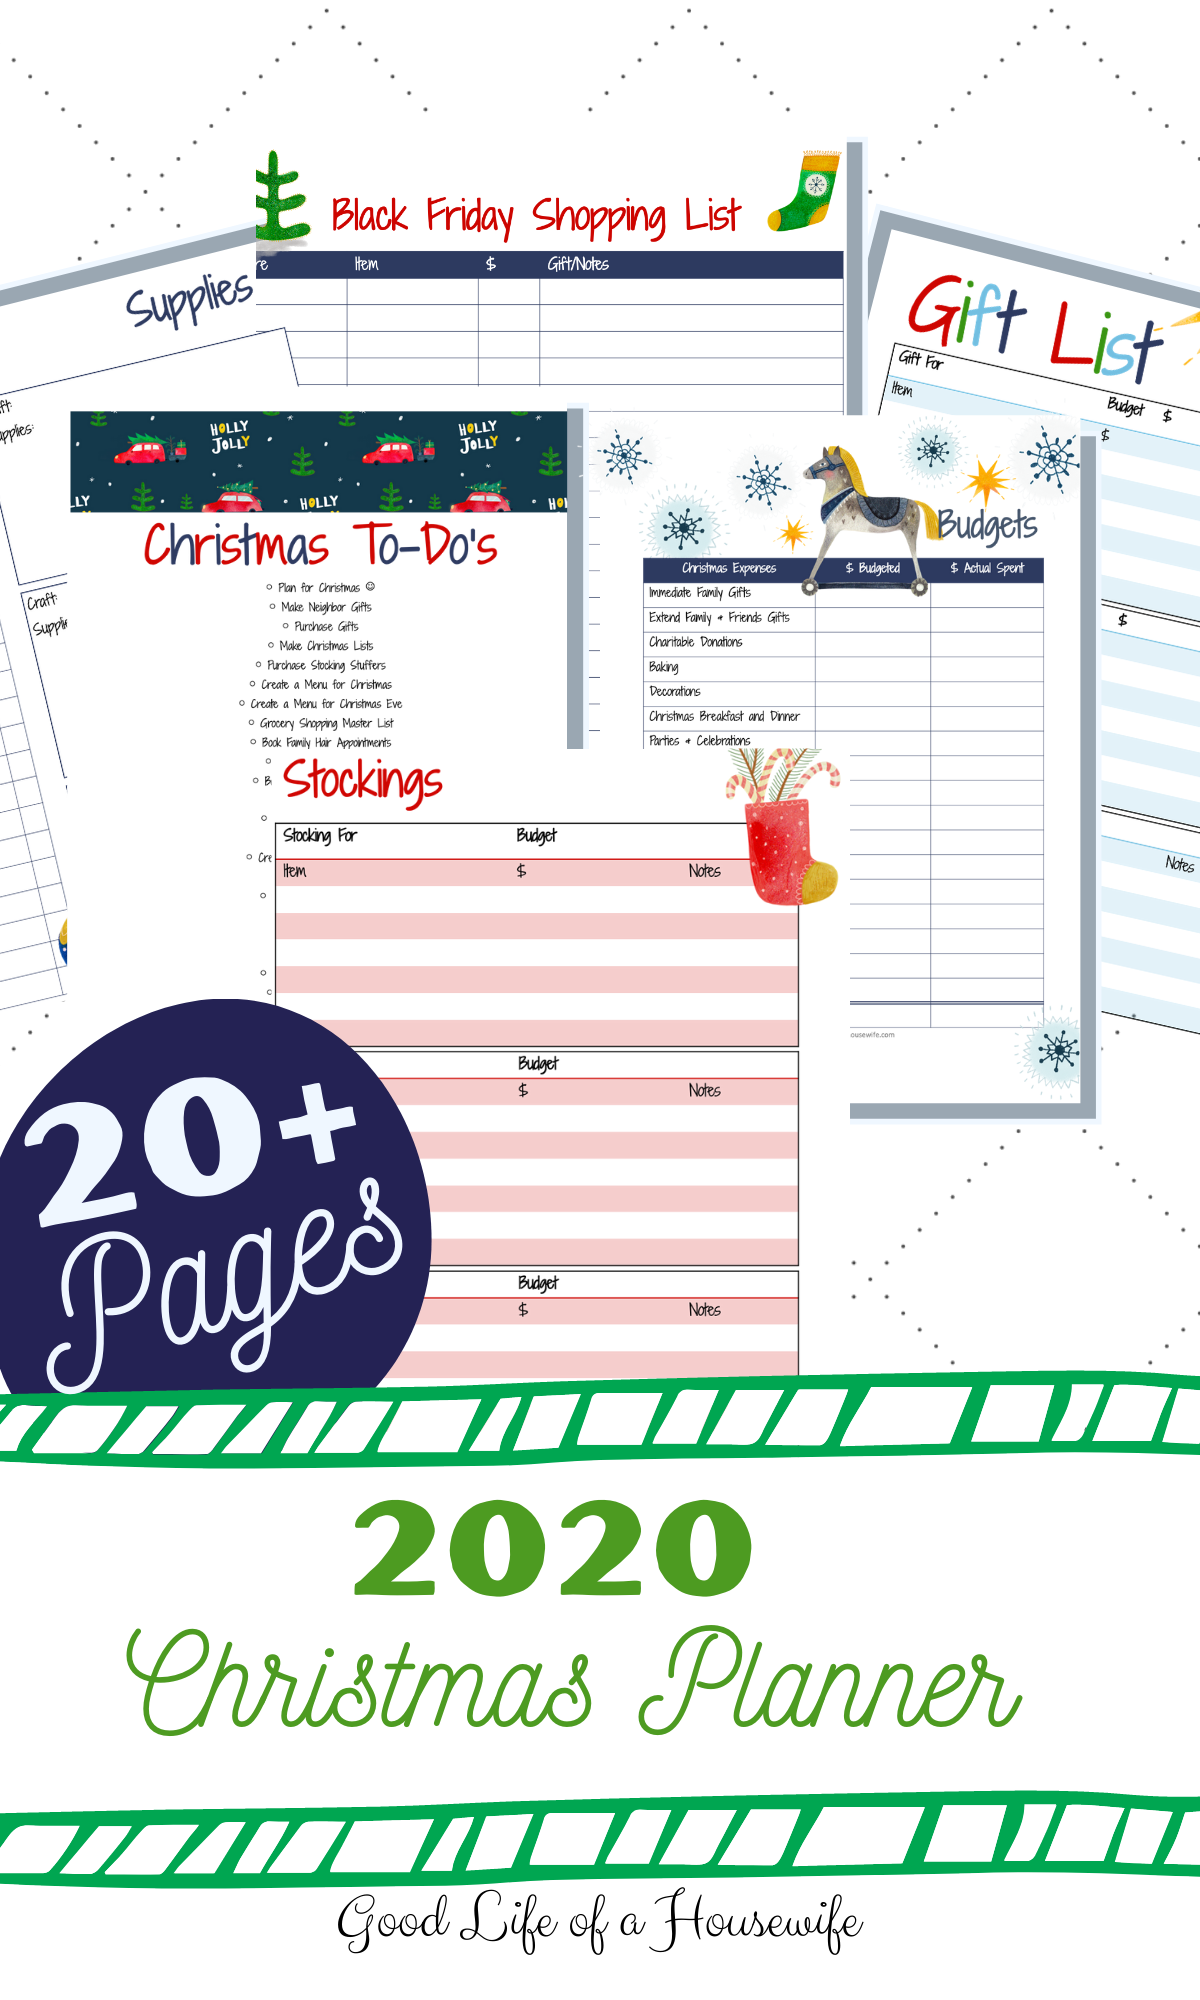 2020 Christmas Planner